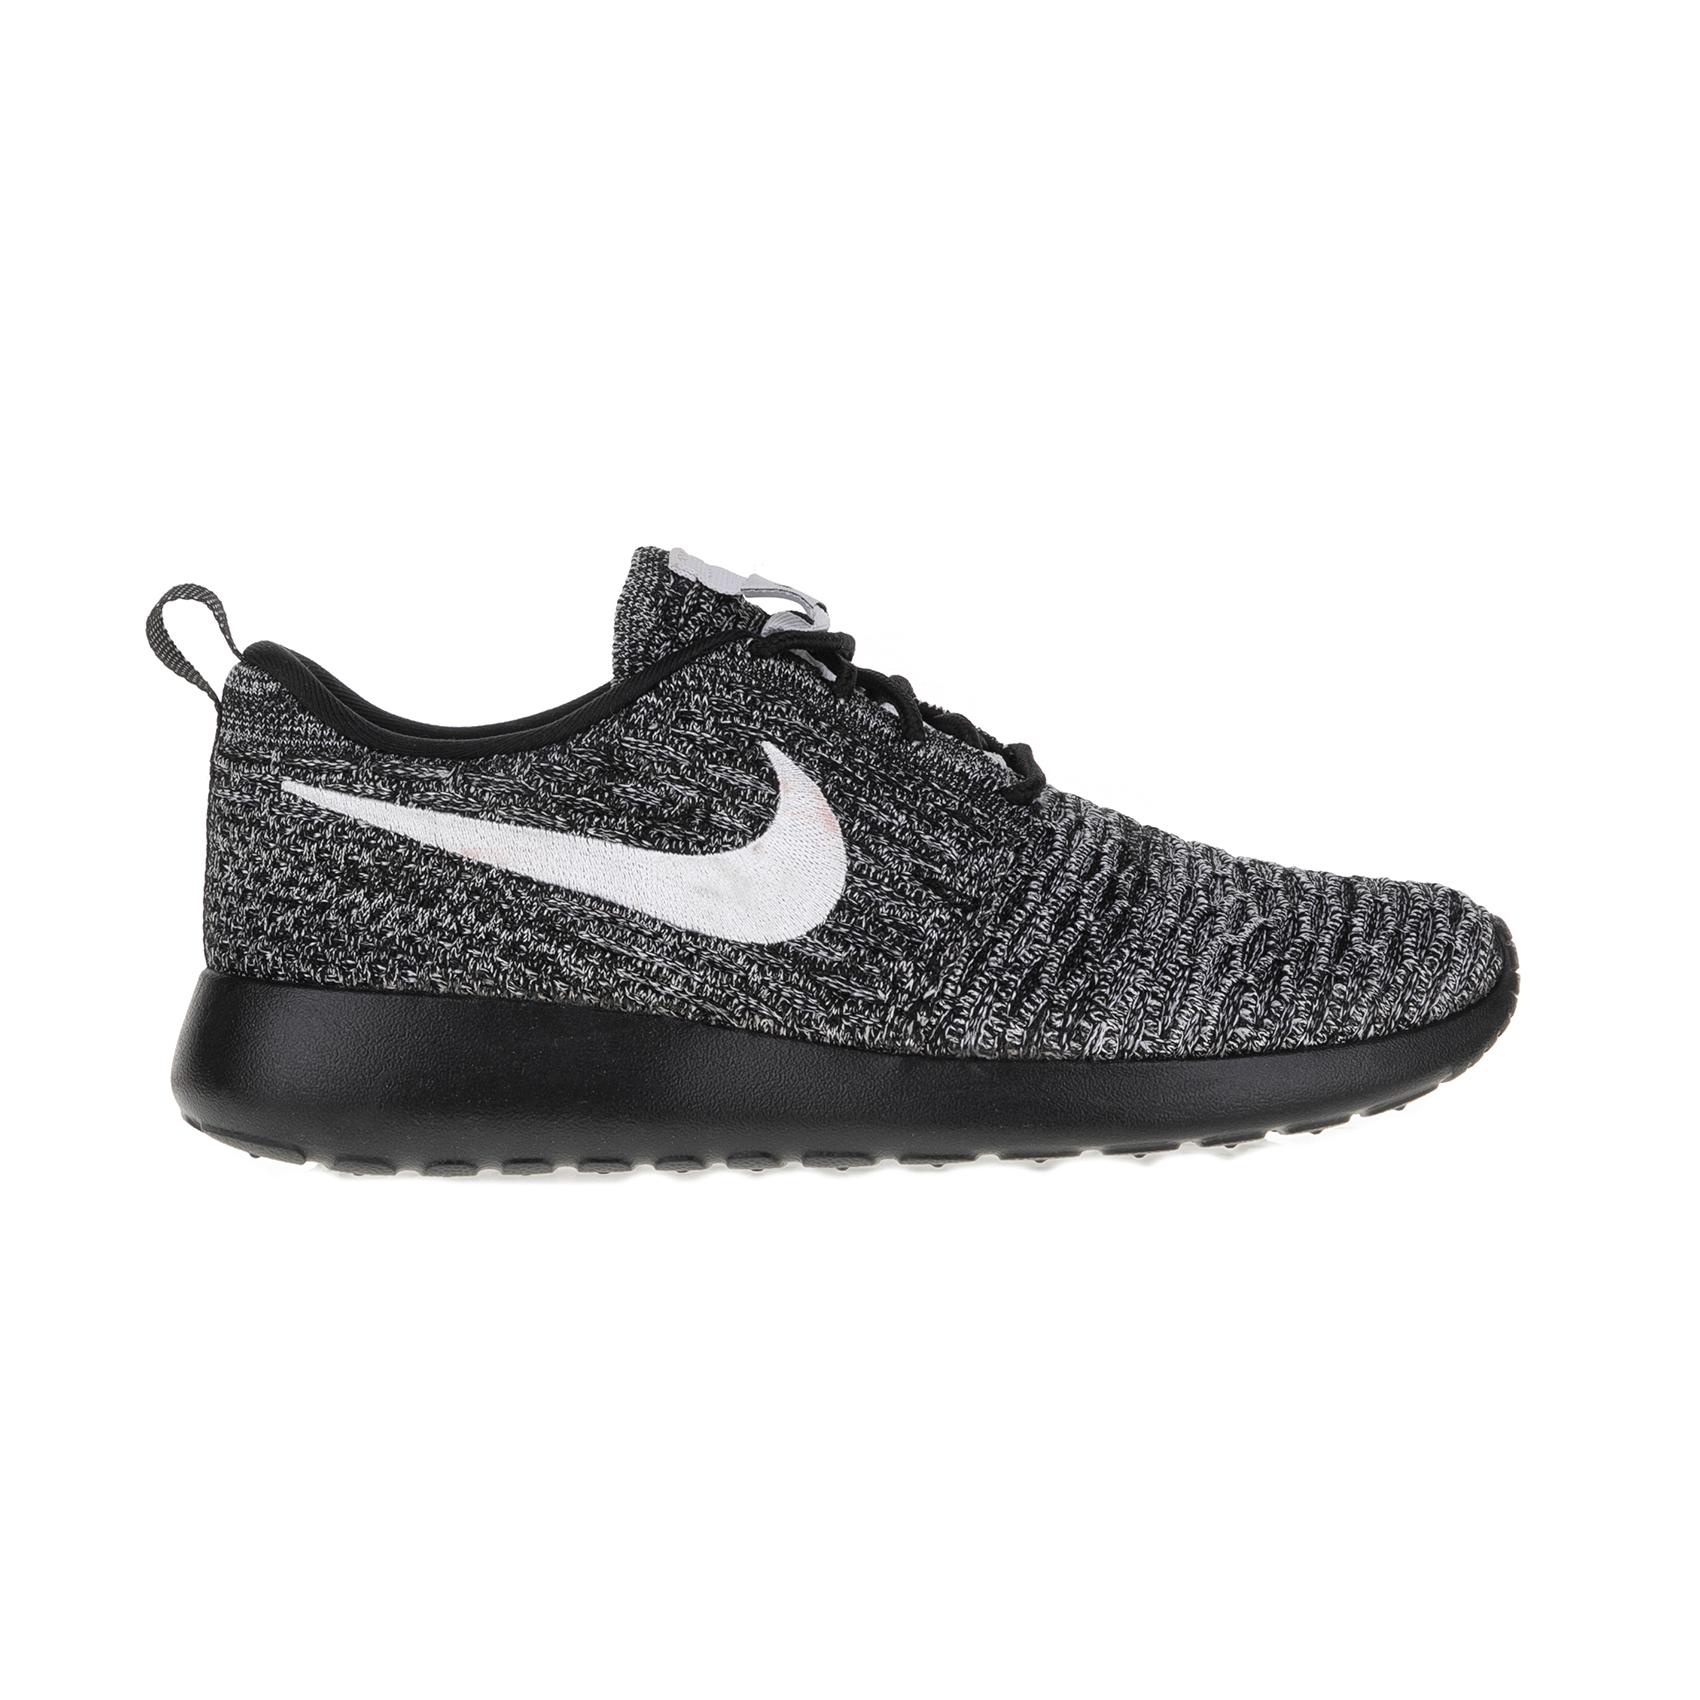 NIKE - Γυναικεία αθλητικά παπούτσια Nike ROSHE ONE FLYKNIT μαύρα γυναικεία παπούτσια αθλητικά running